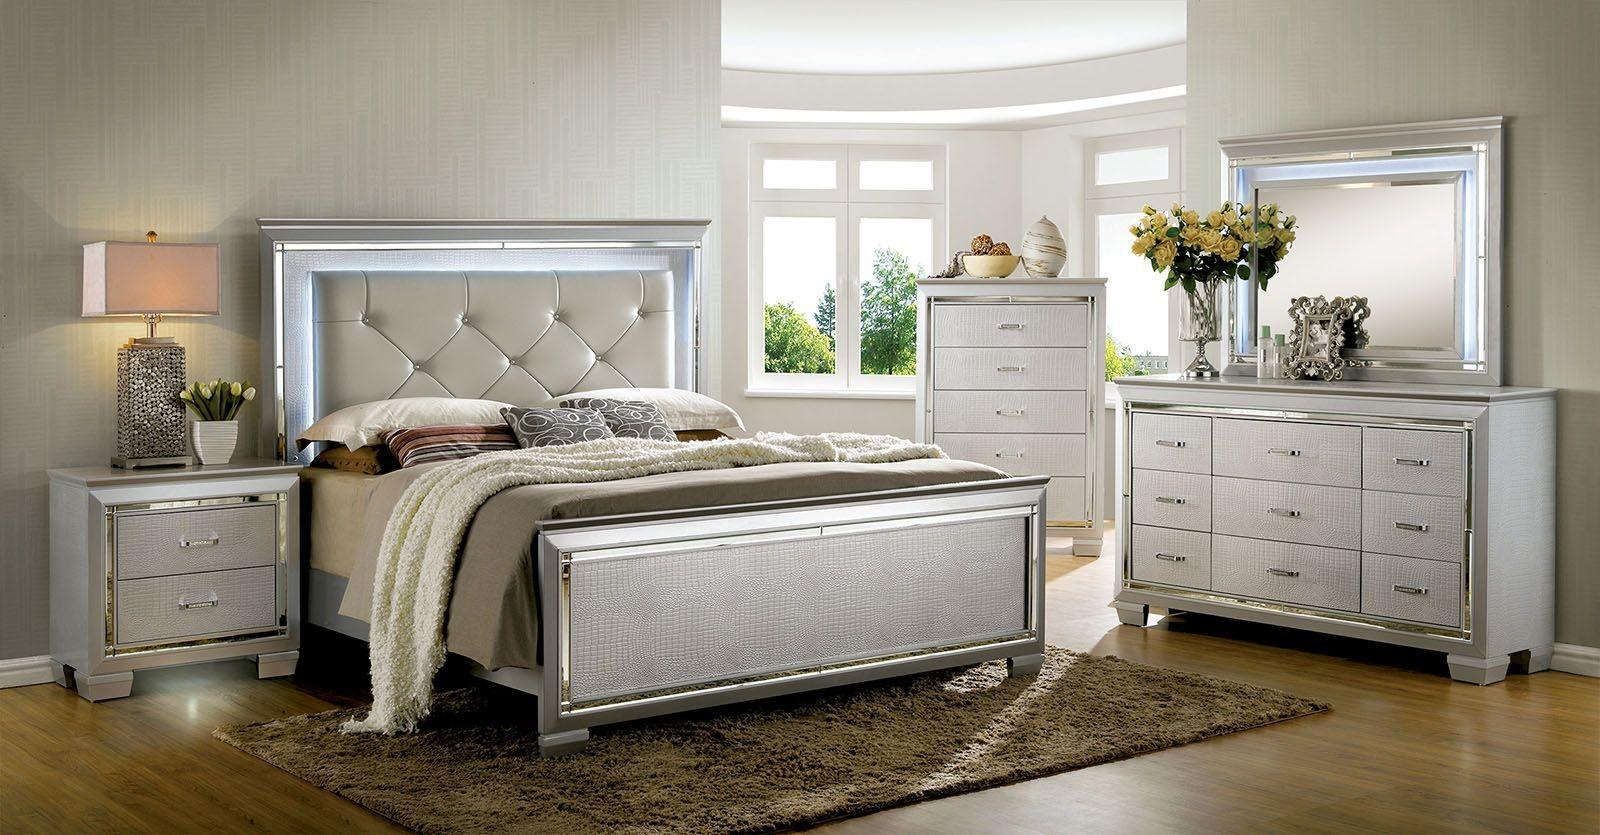 silver bedroom sets photo - 7